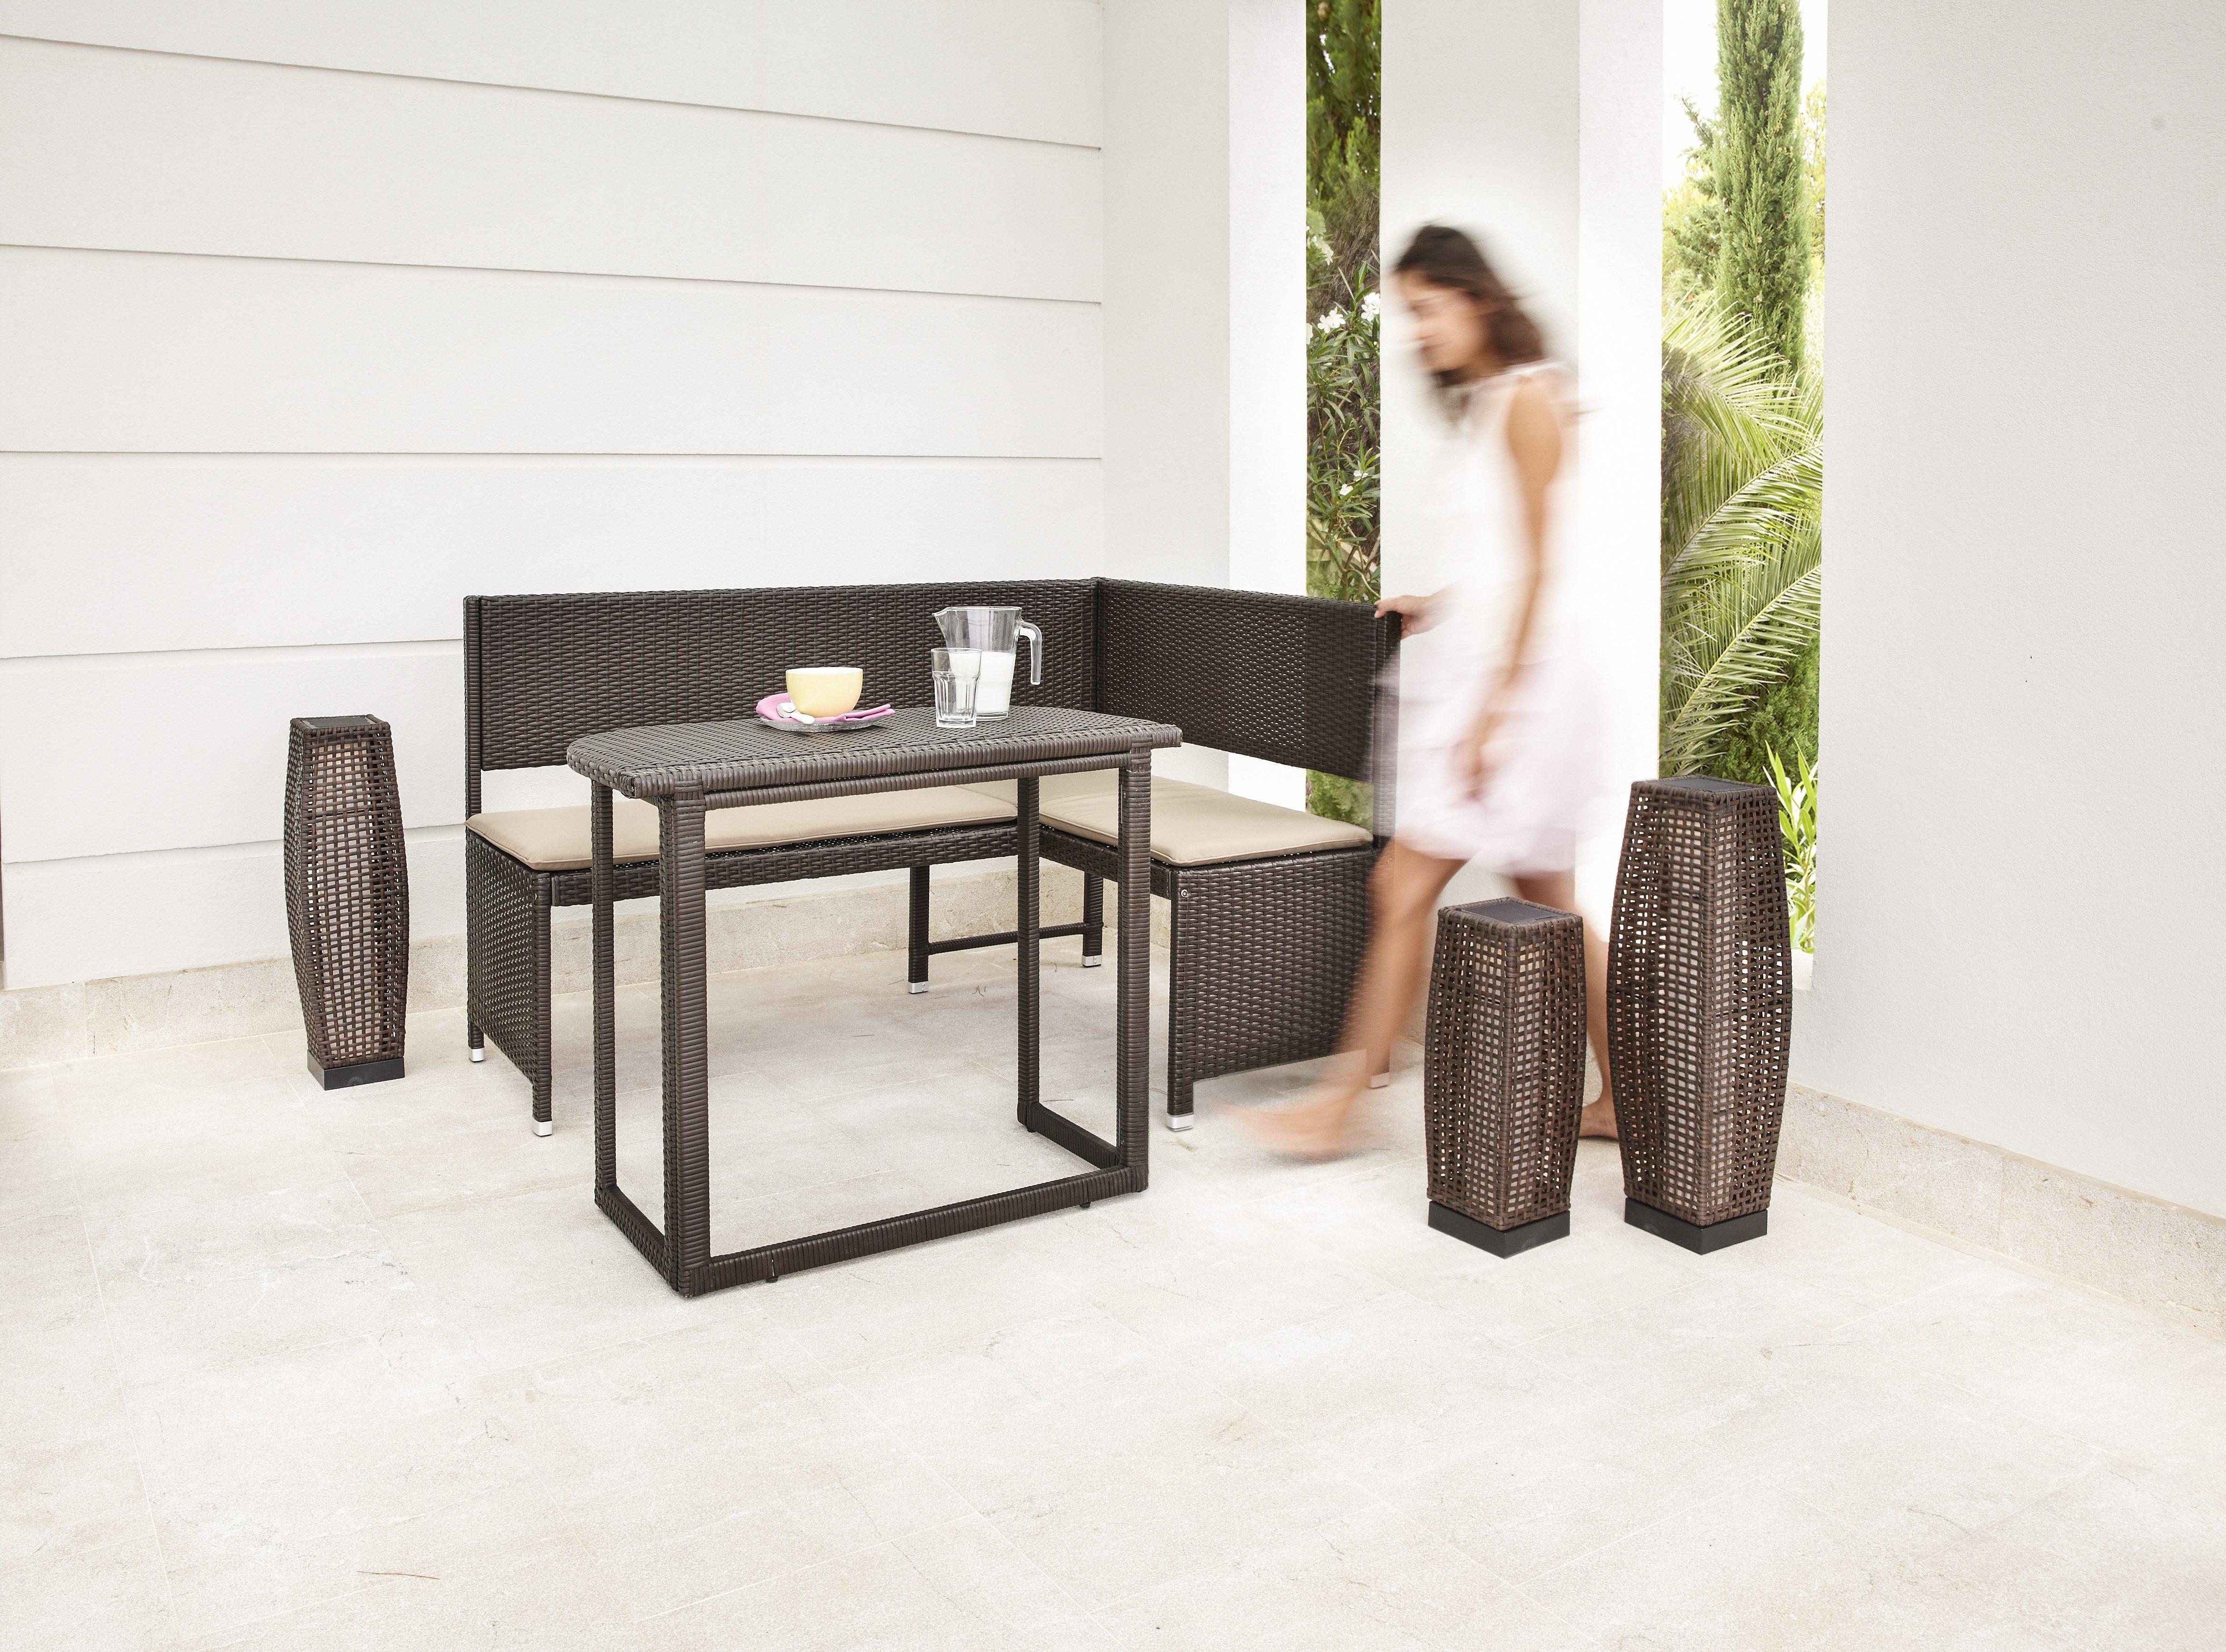 Gartenmöbelset »Rattan«, 4-tlg., Eckbank, Tisch90x50 cm, Polyrattan, braun